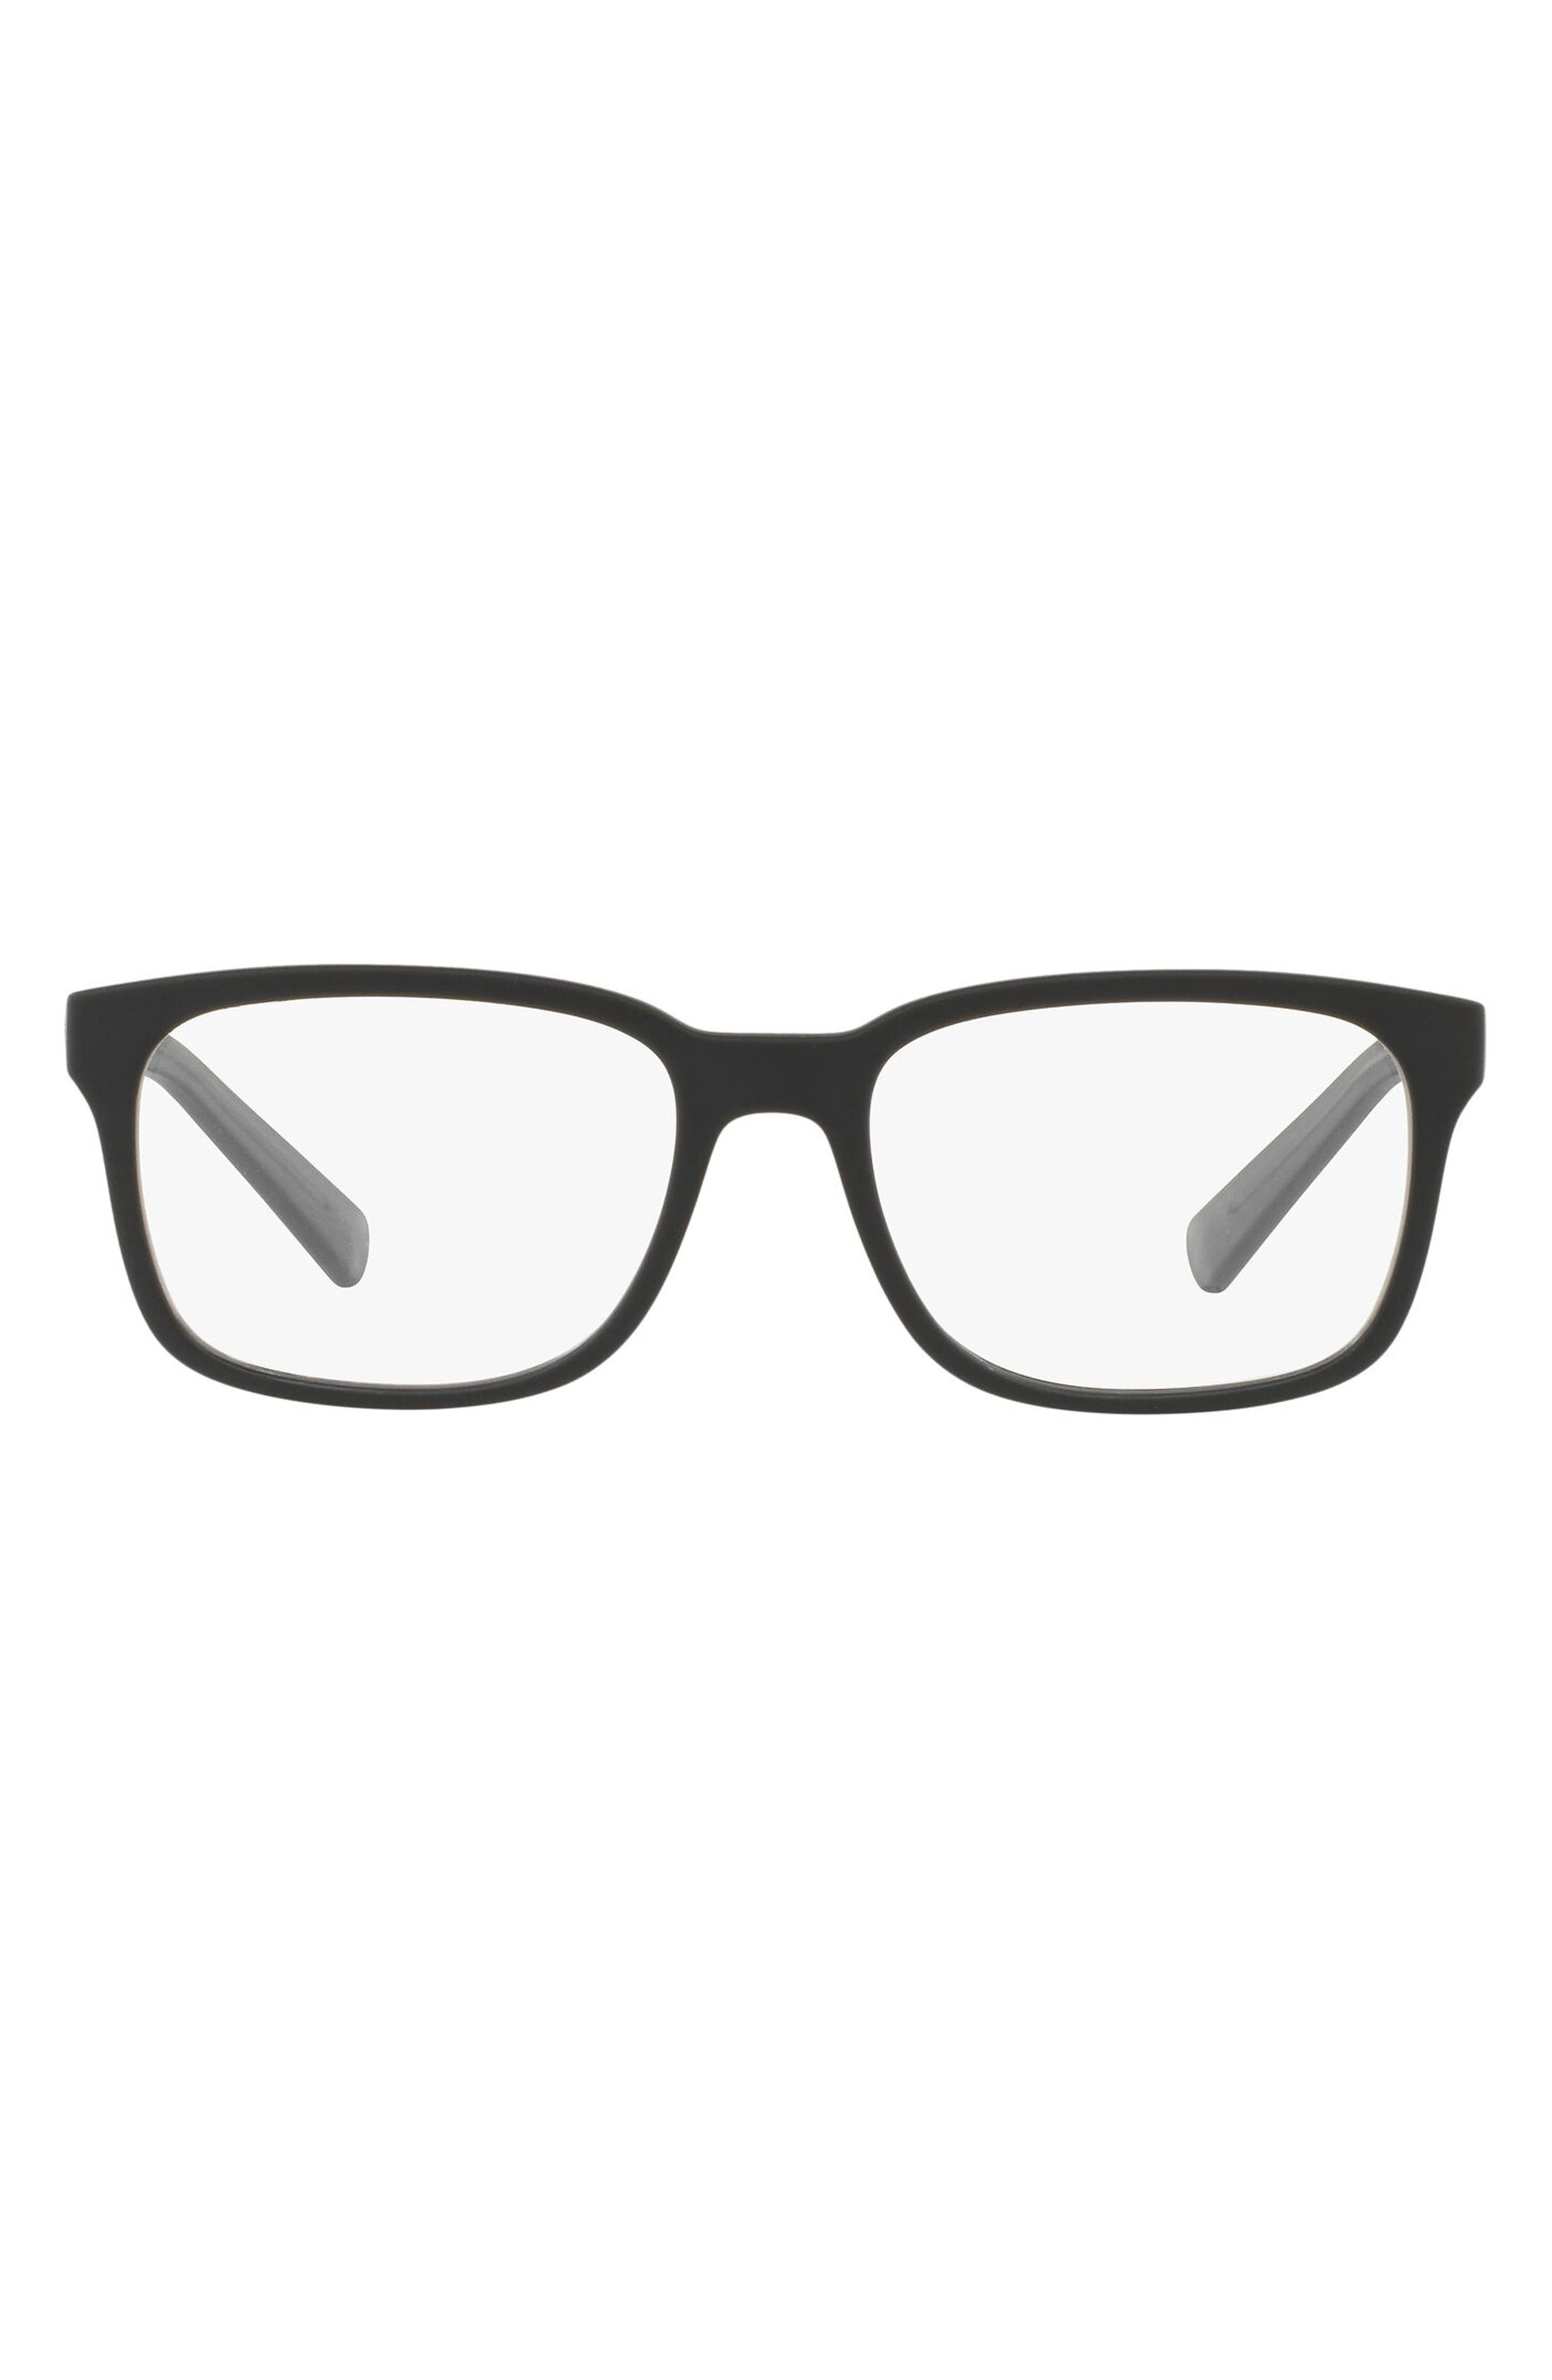 54mm Square Optical Glasses